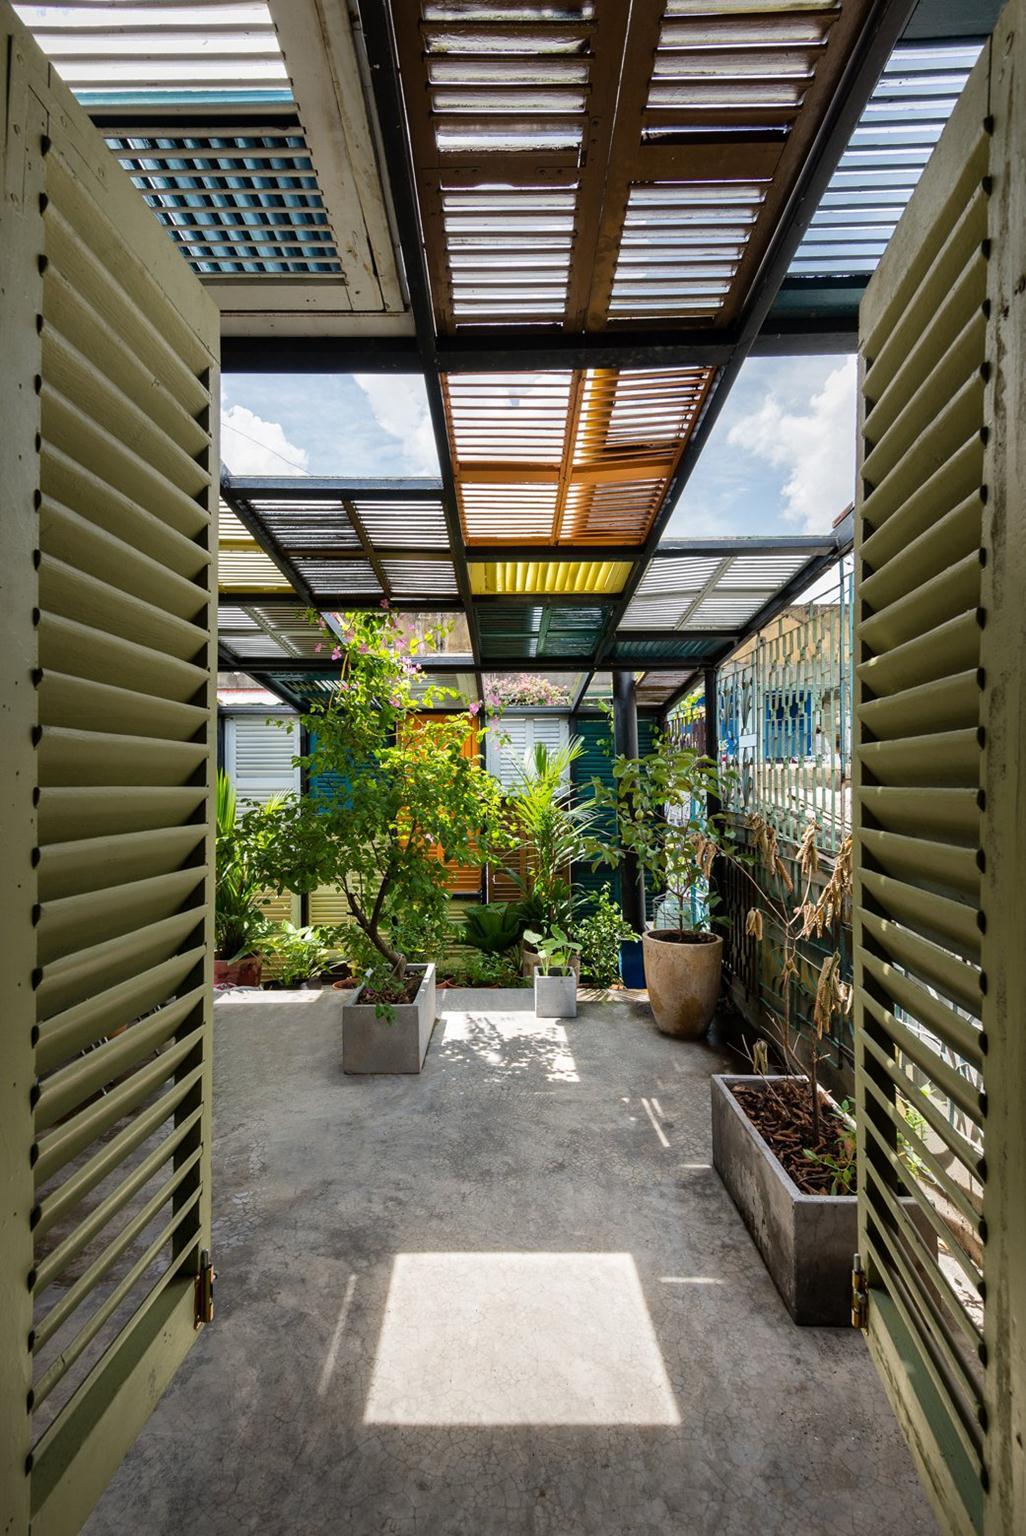 557a5b4ee58ecedce5000212_vegan-house-block-architects_19 (Copy)